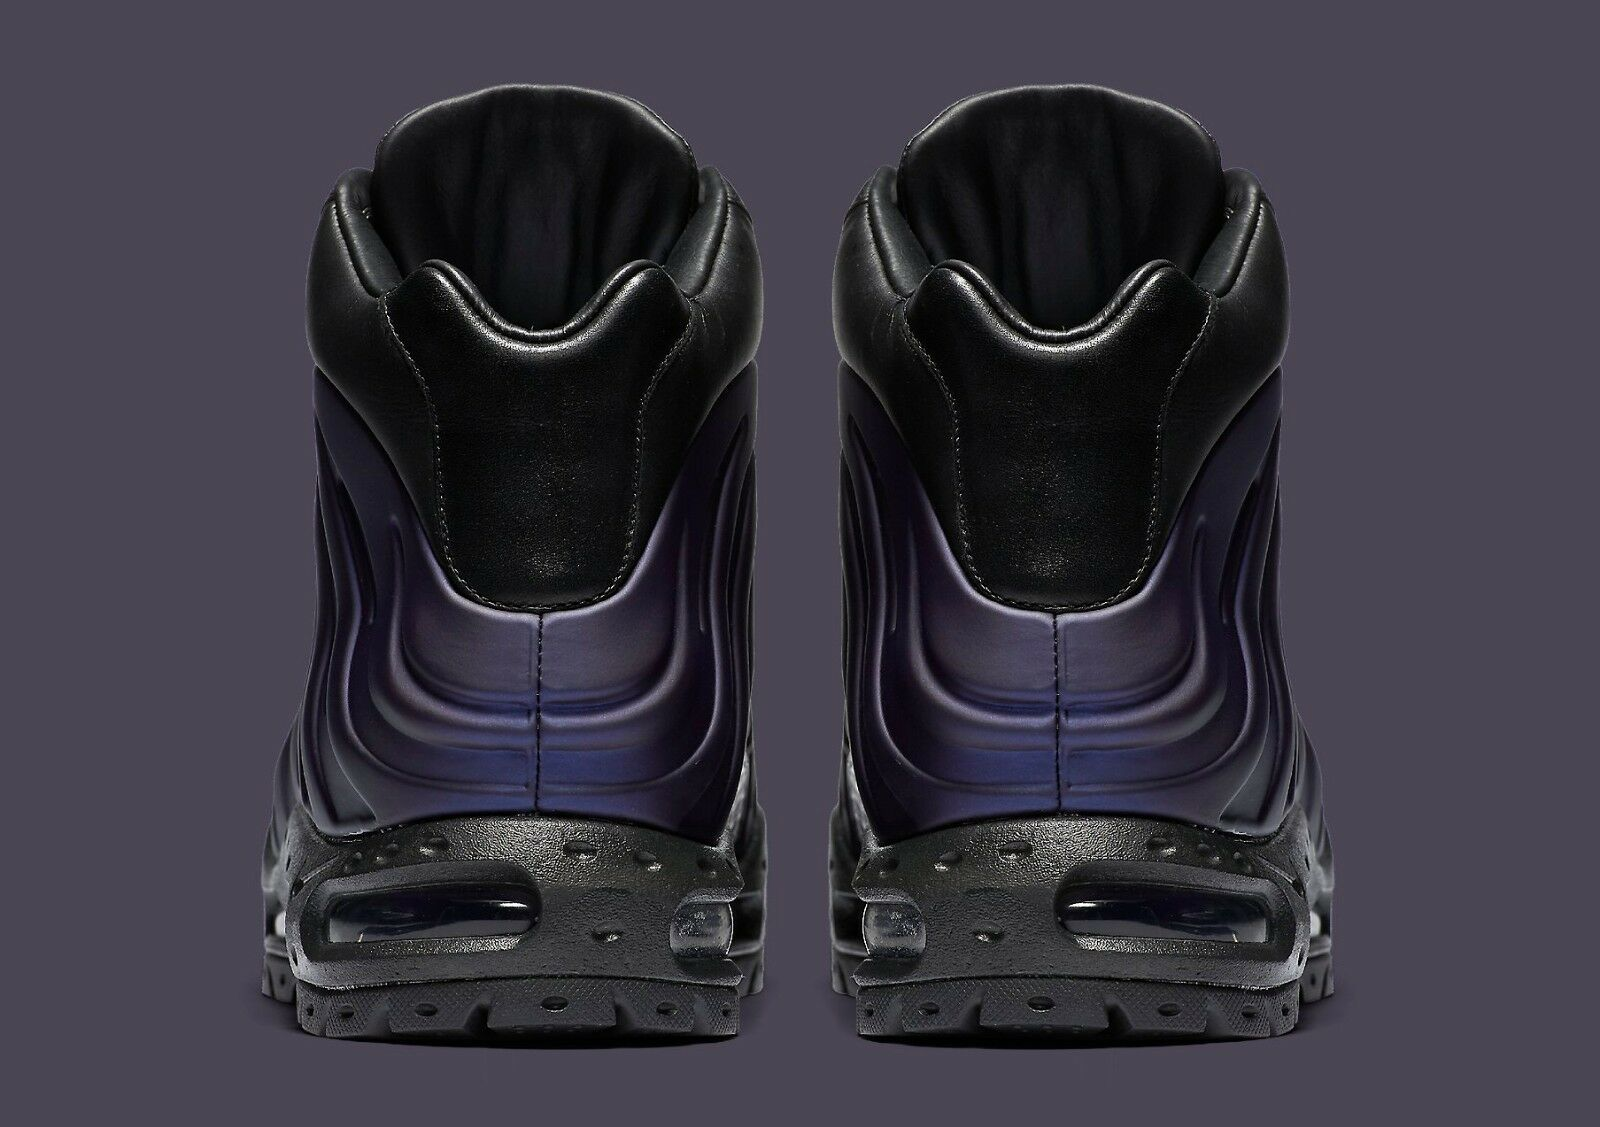 Nike air max foamdome foamposite melanzane 9 843749 500 uomini sz 9 melanzane stivali 2c81d9